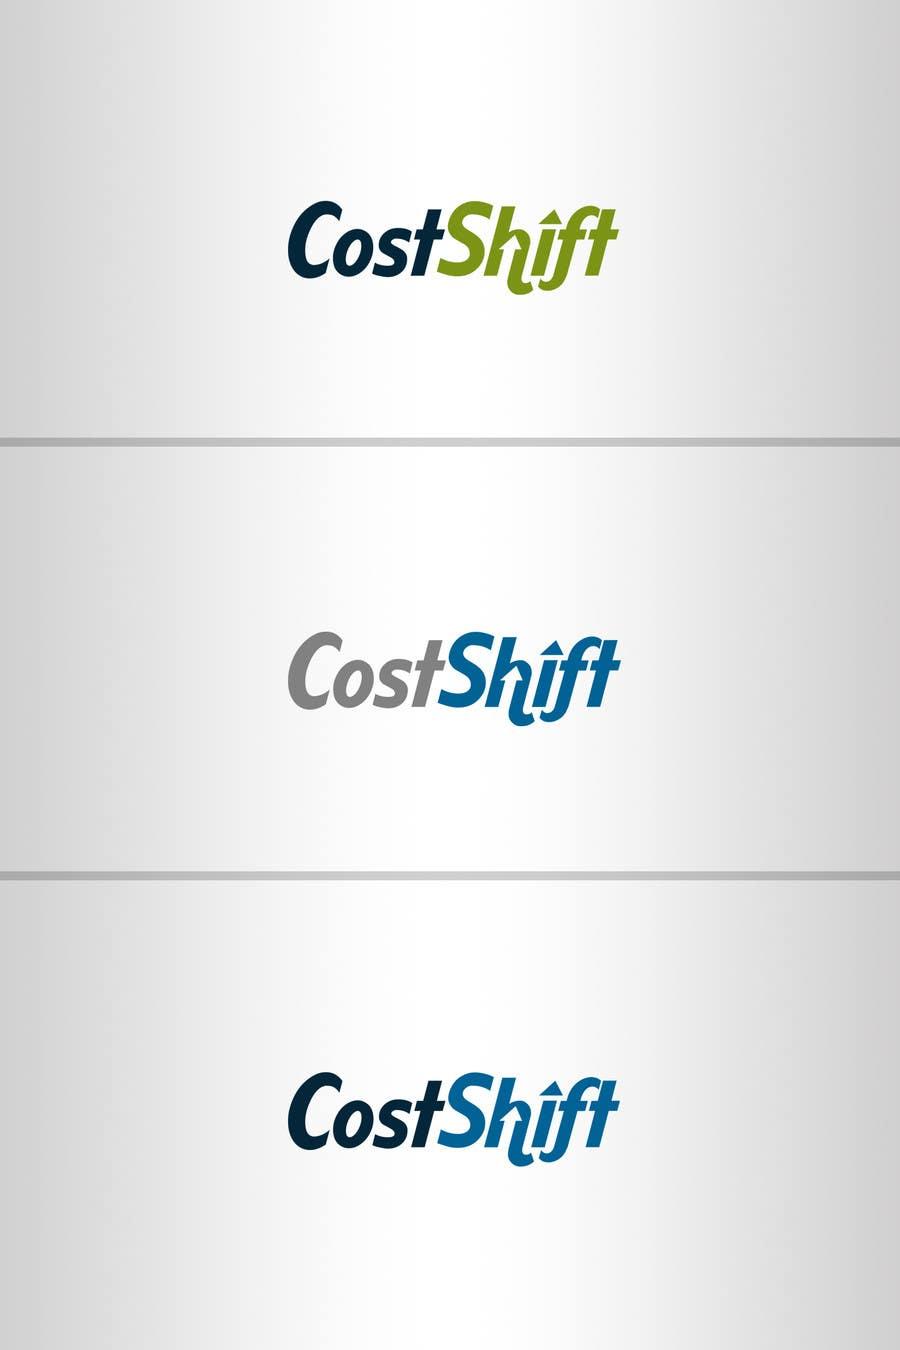 Kilpailutyö #115 kilpailussa Design a Logo For COSTSHIFT